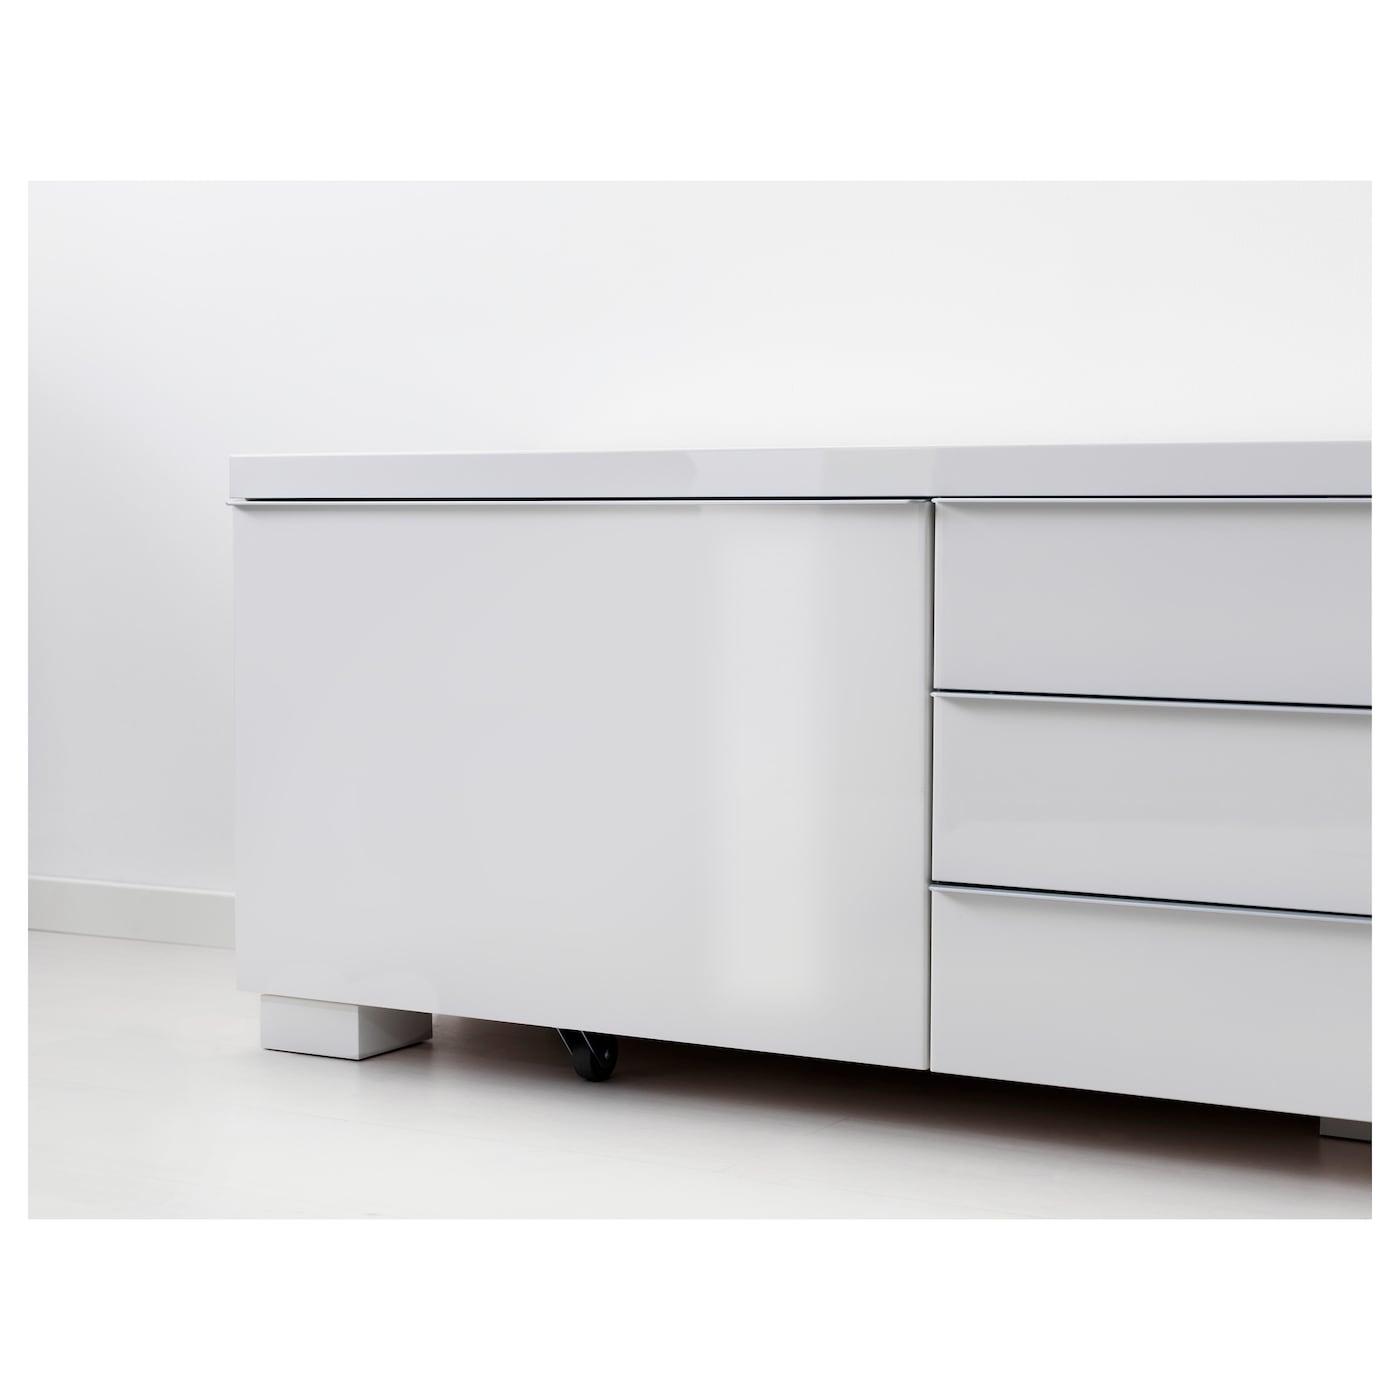 Bestå Burs Tv Meubel Hoogglans Wit 180 X 41 X 49 Cm Ikea